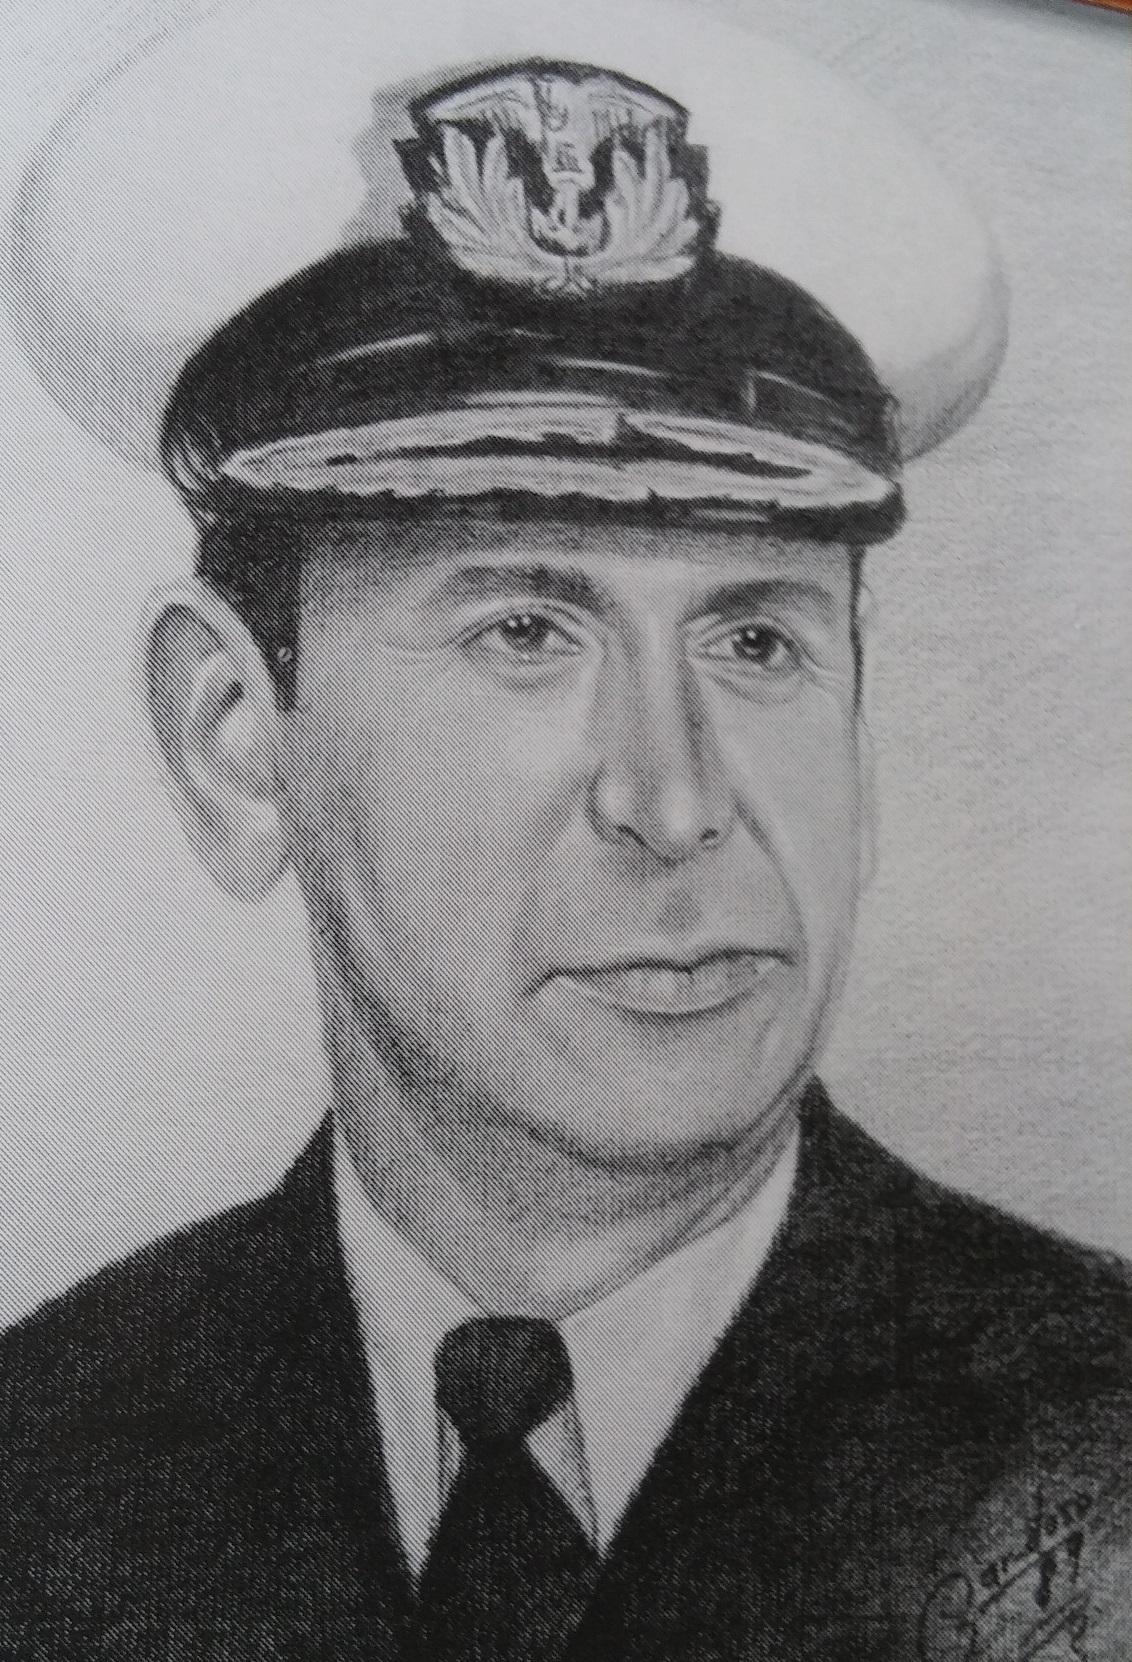 BGCIM JORGE ANTONIO SANCHEZ RAMIREZ